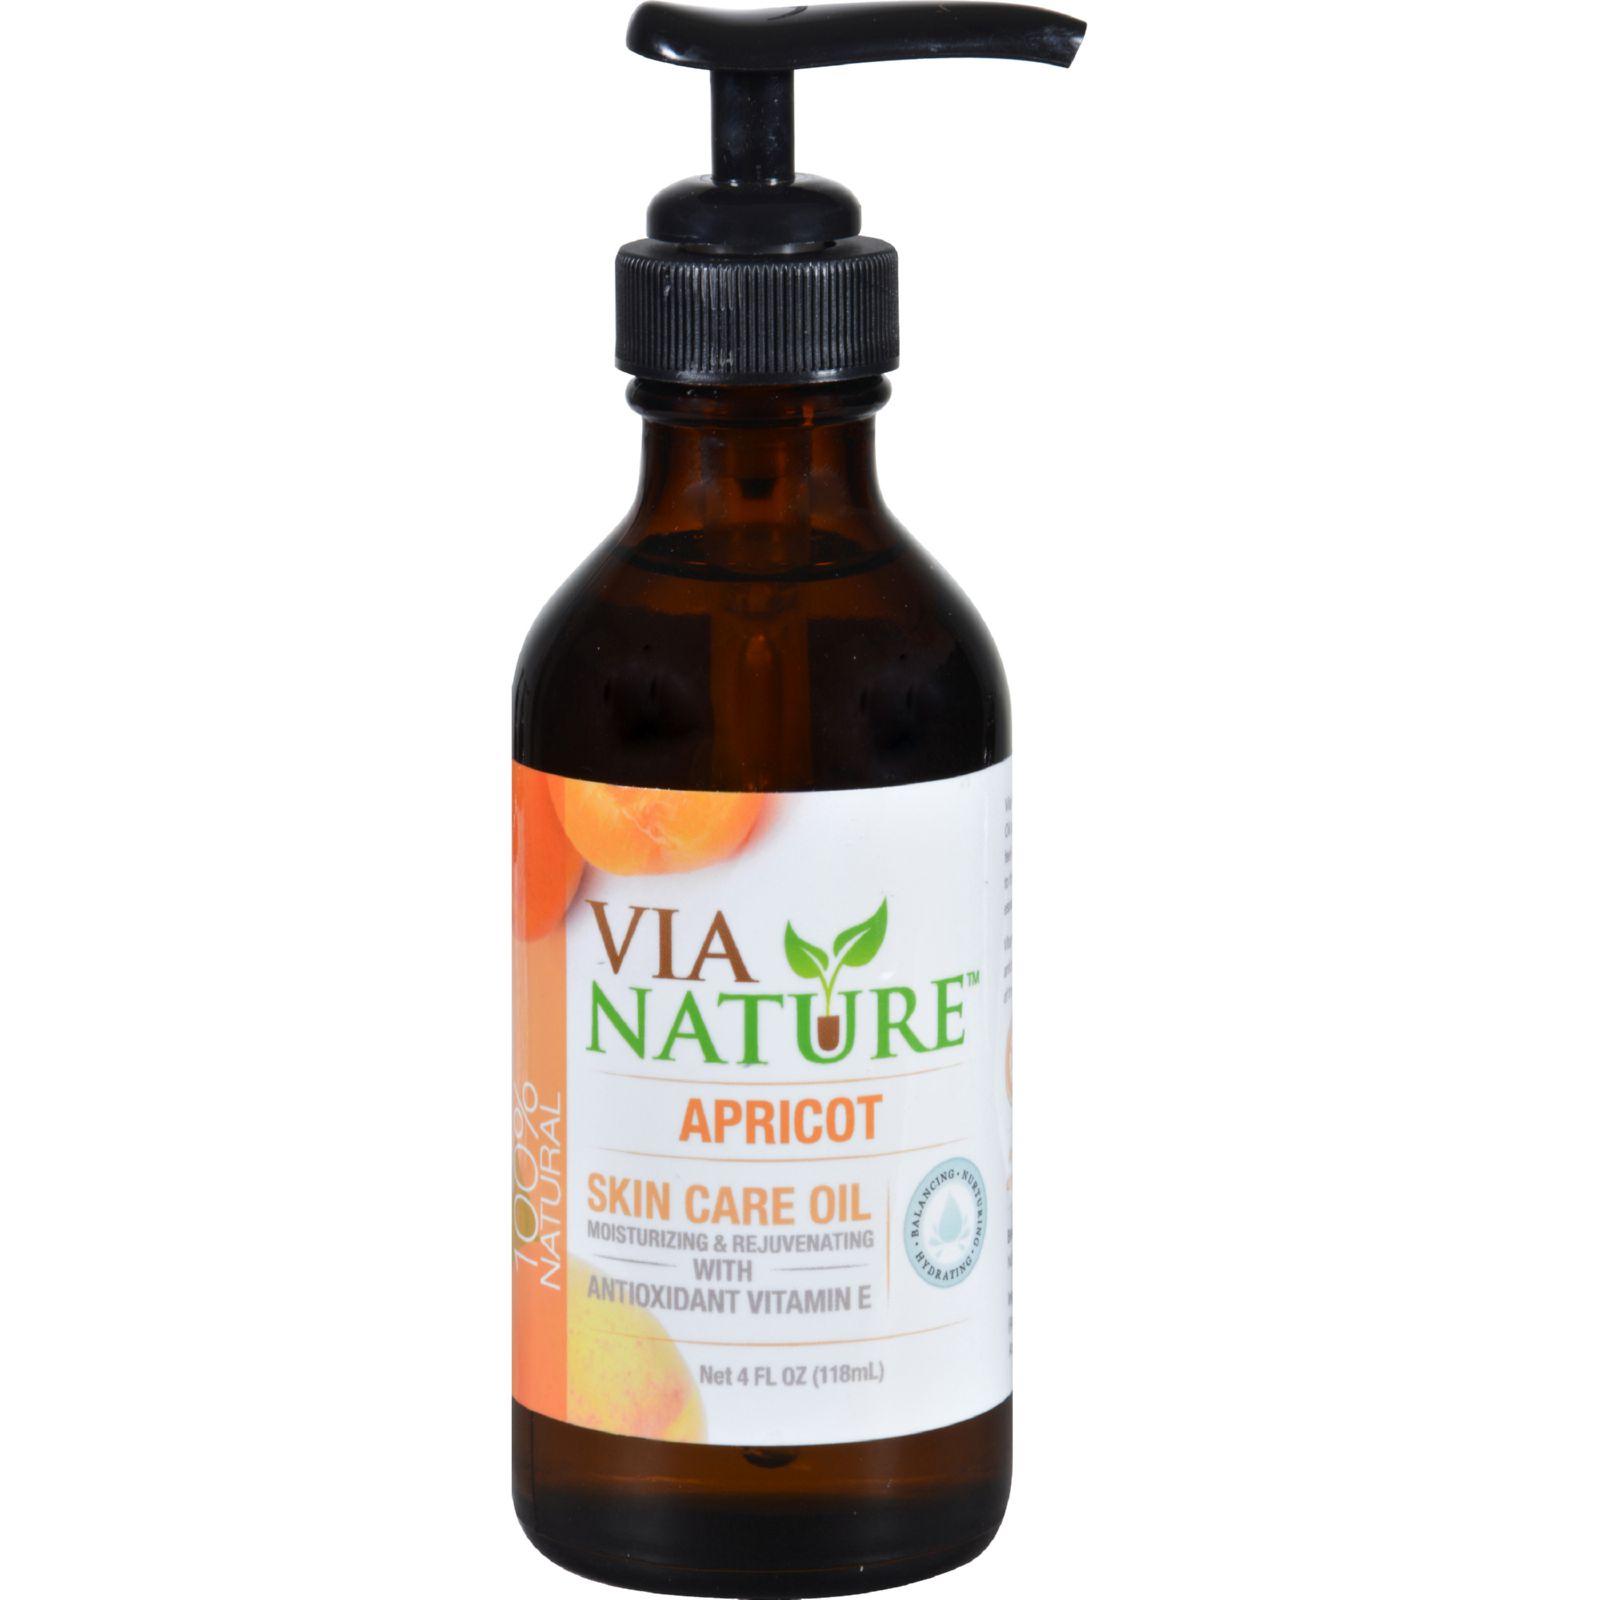 Via Nature Carrier Skin Care Oil - Apricot - Moisturizing - 4 Fl Oz